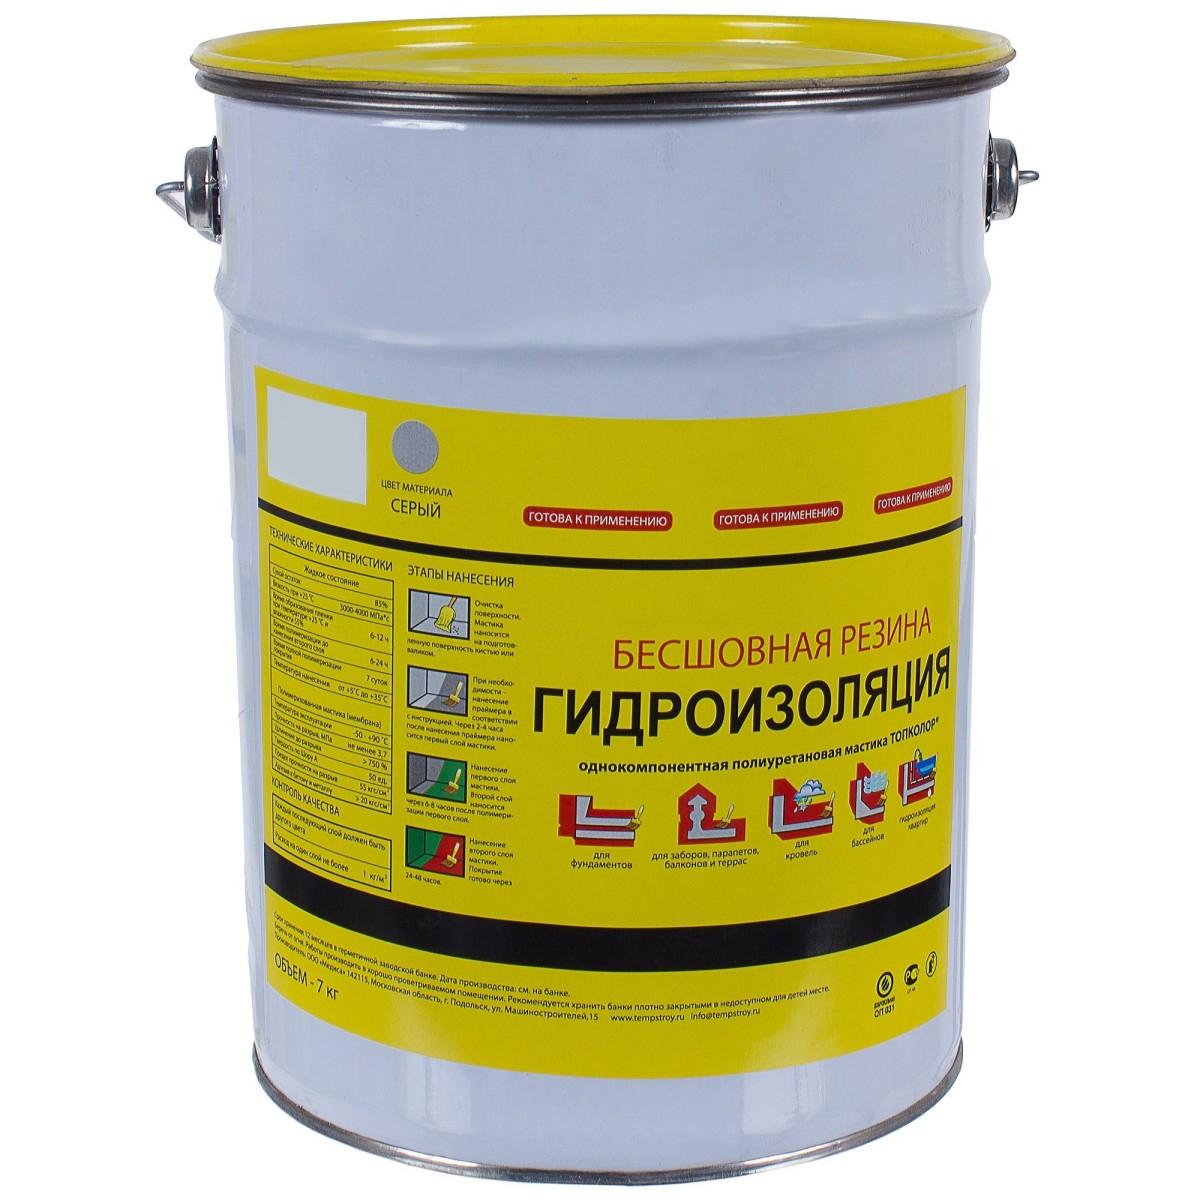 Мастика гидроизоляционная Топколор 7 л цвет серый